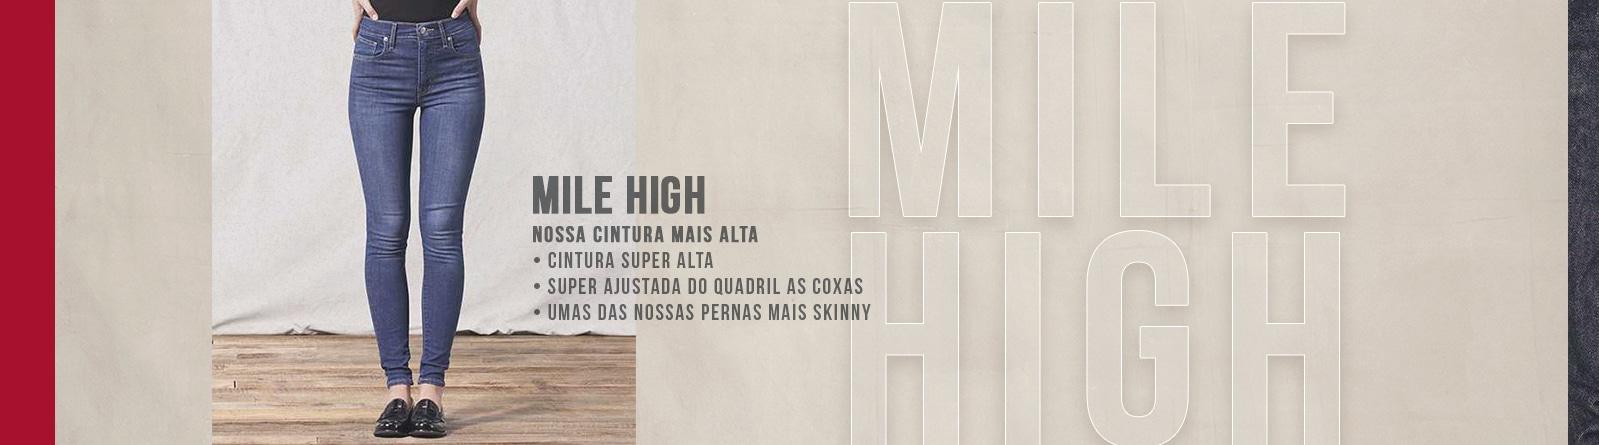 Mile High Levis